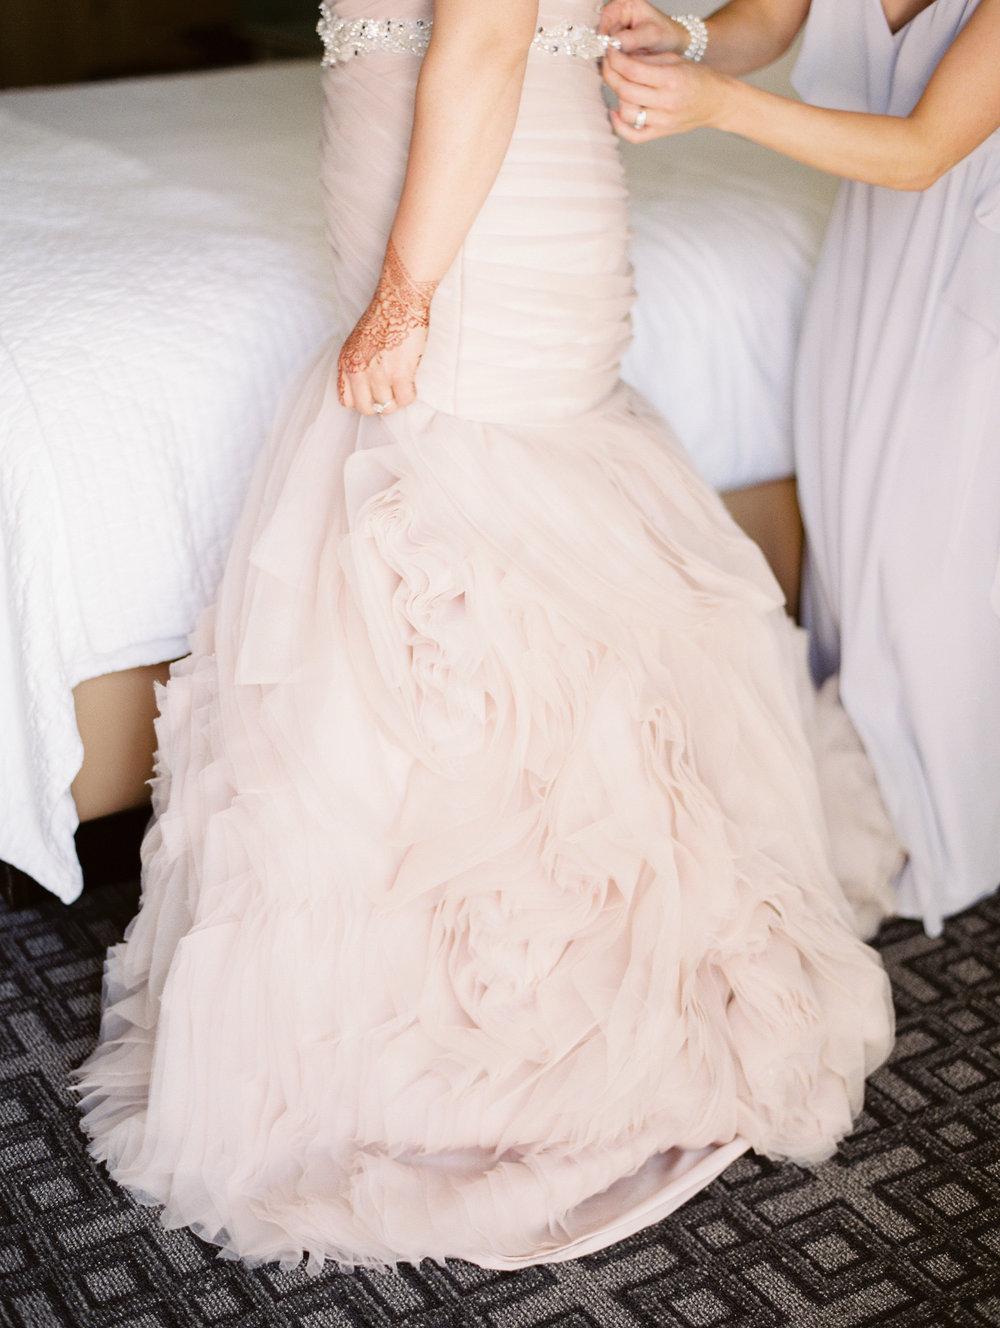 Govathoti+Wedding+Getting+Ready-97.jpg